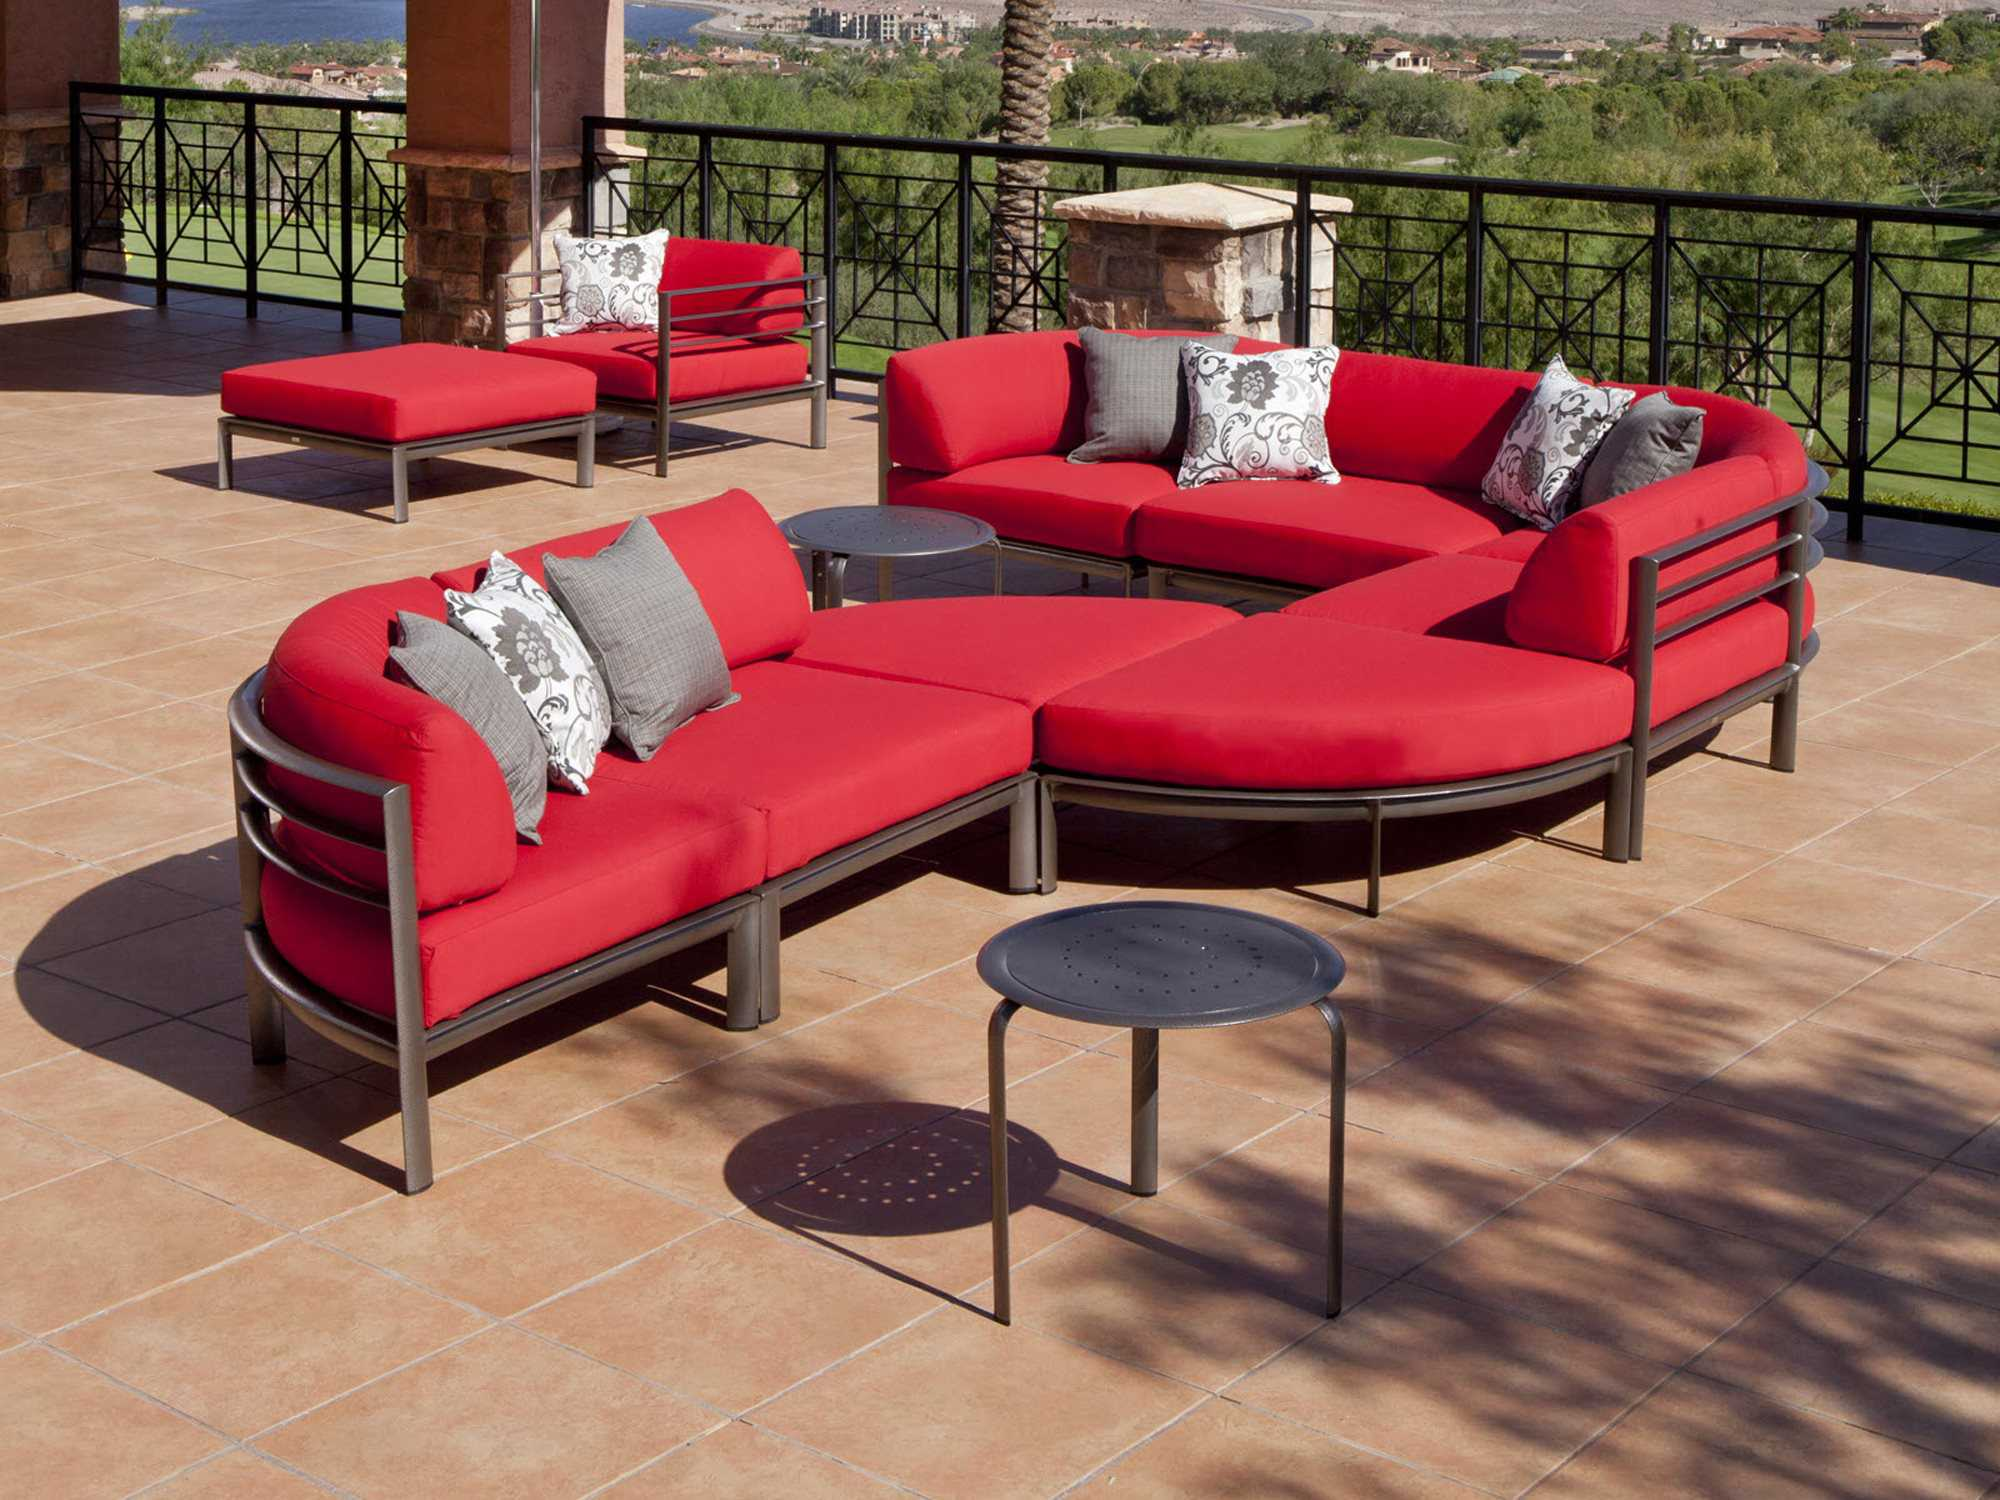 winston southern cay modular aluminum lounge set southernsecset. Black Bedroom Furniture Sets. Home Design Ideas